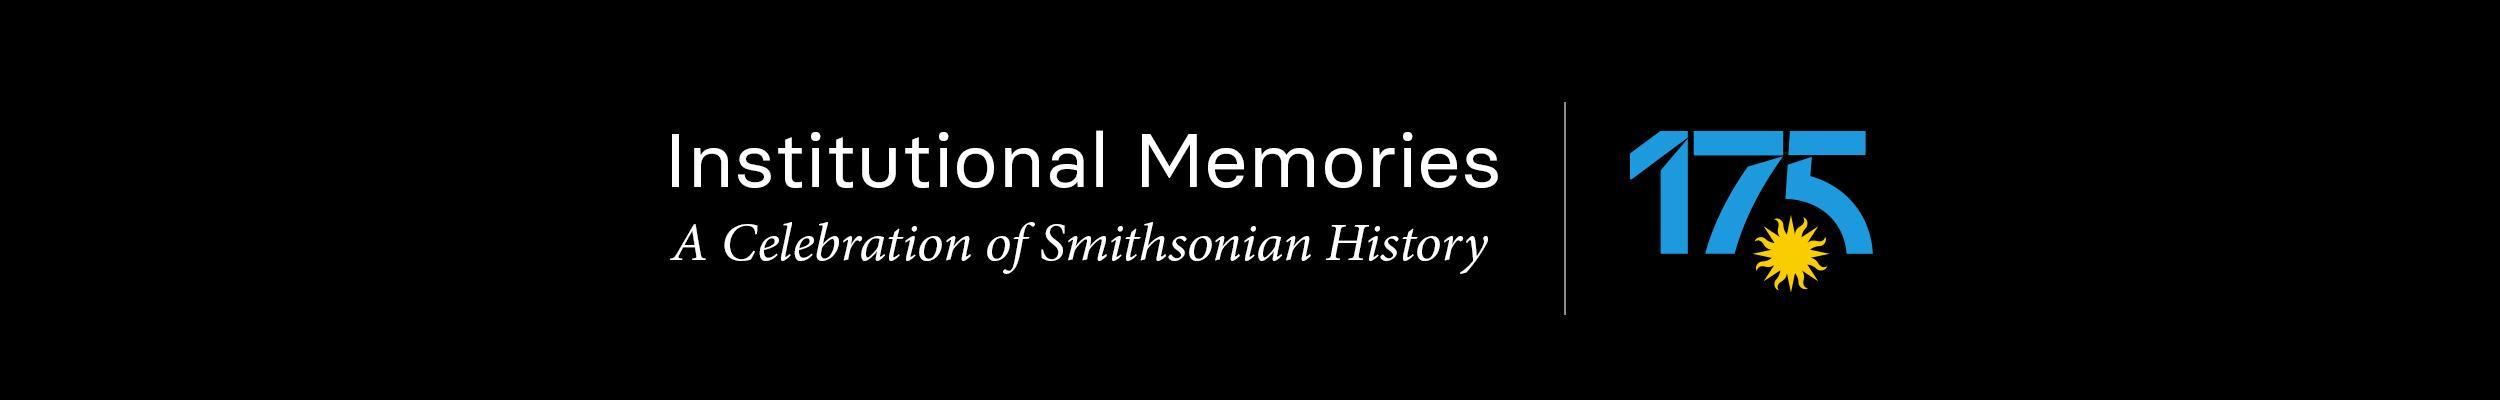 Smithsonian 175